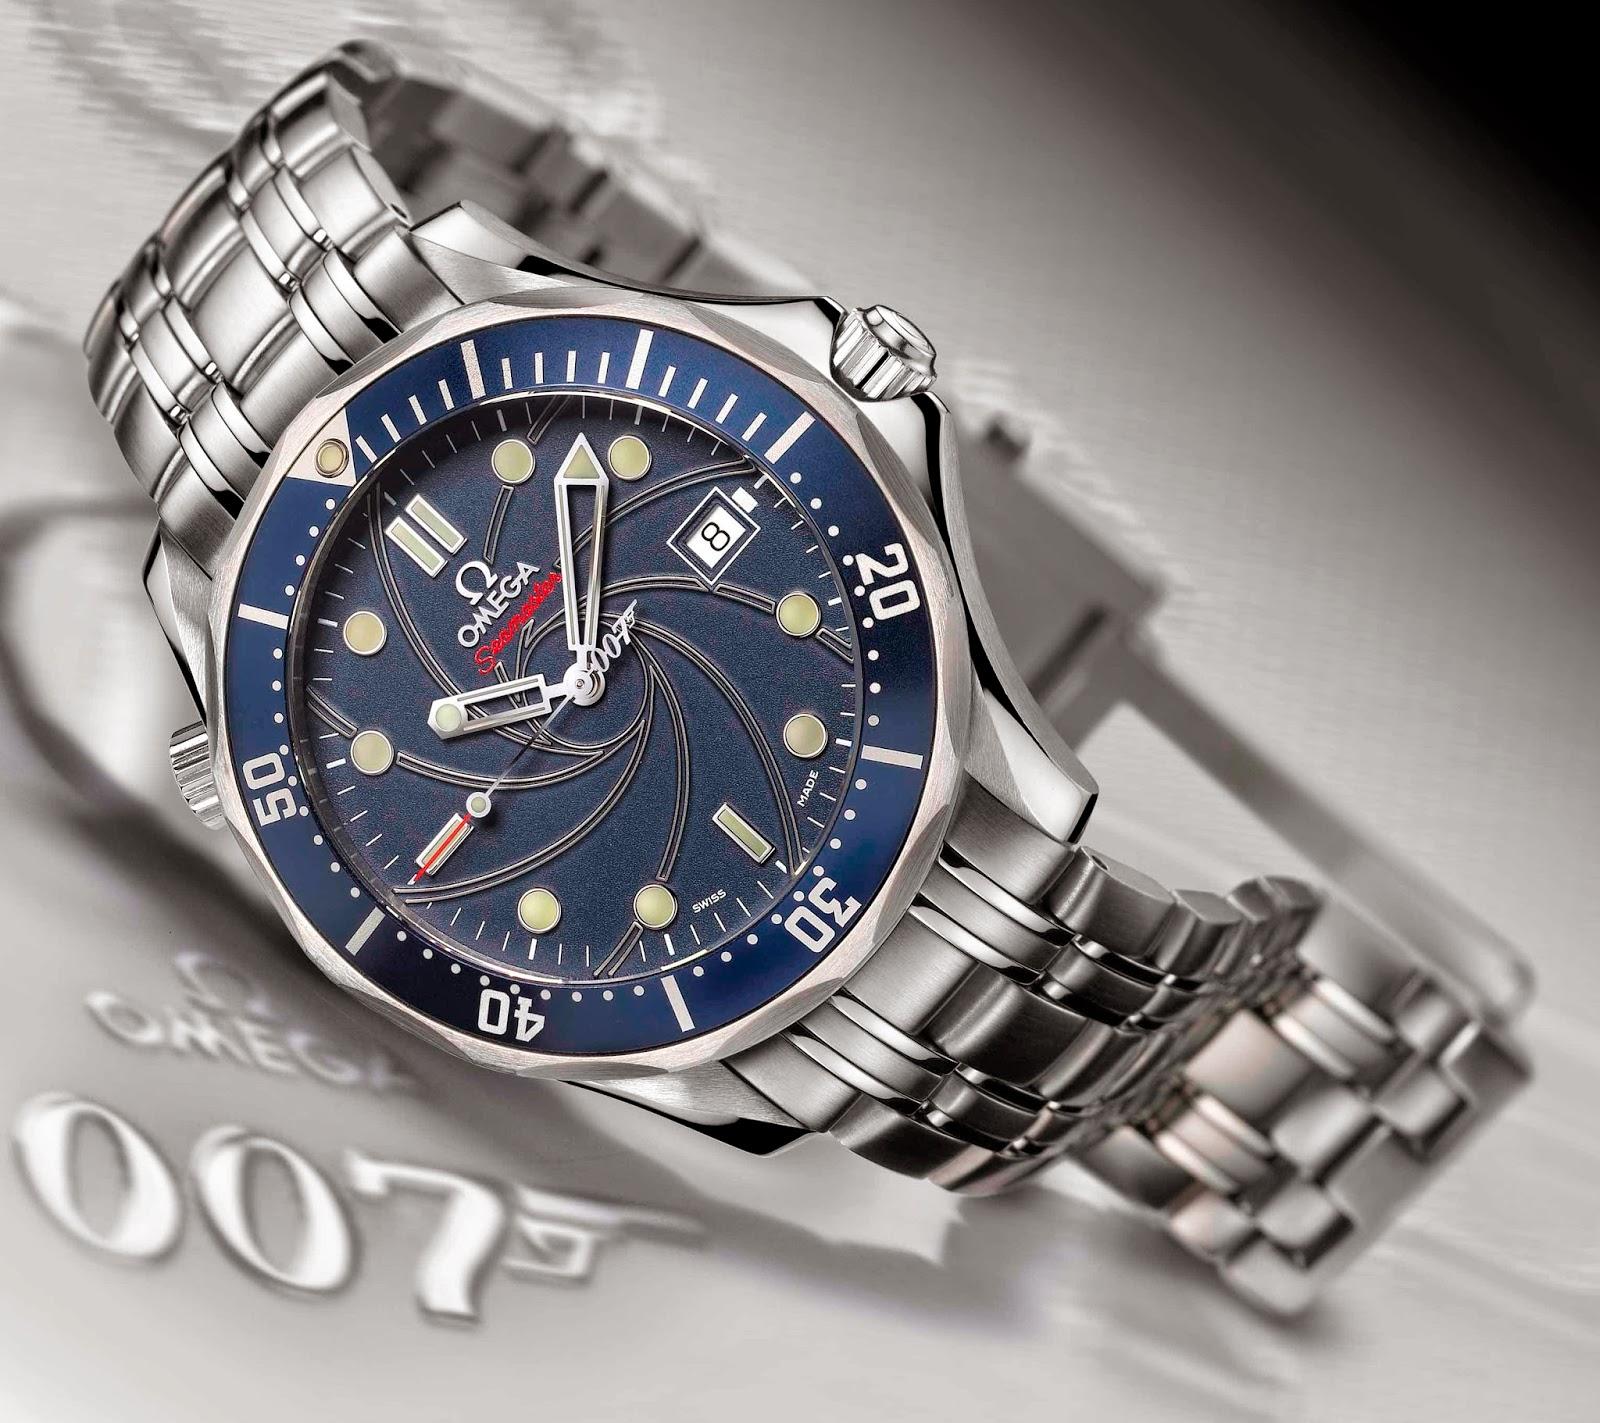 Omega Seamaster James Bond Limited Series, Edition 2006